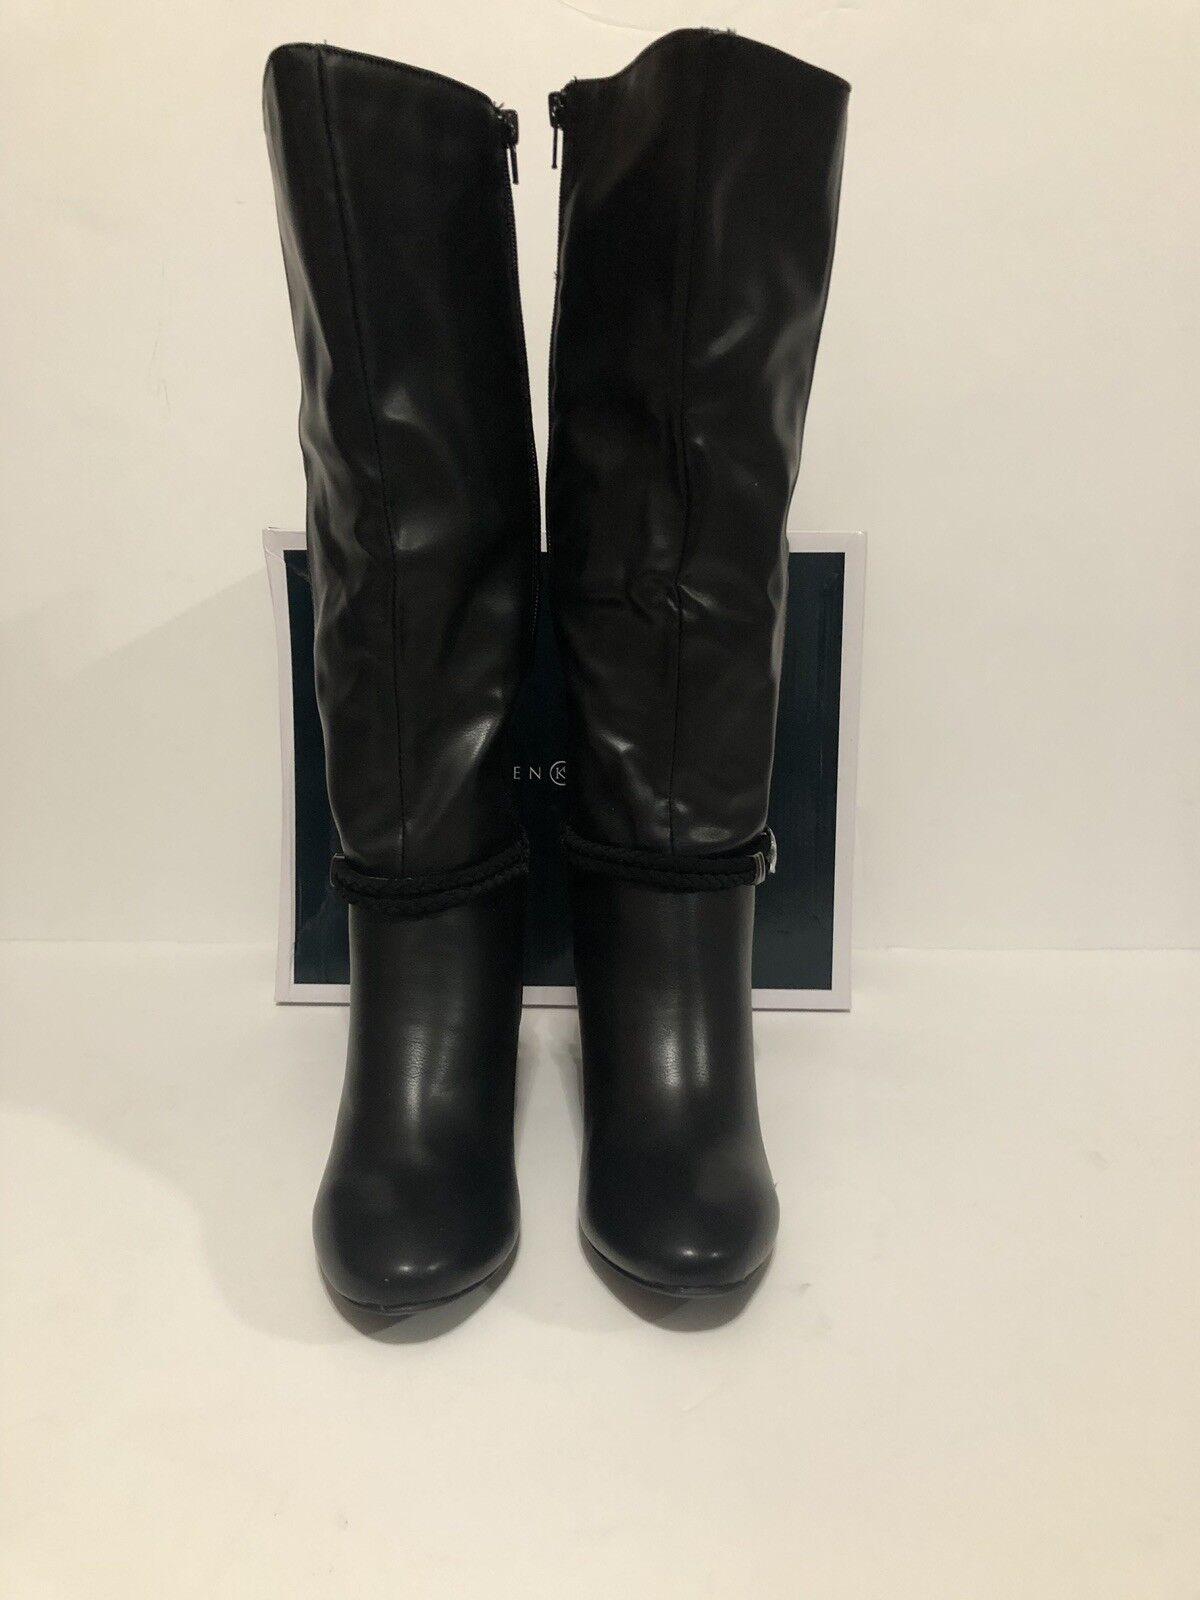 Karen Scott Galee Wide-Calf 89 Stiefel 6.5M Retail 89 Wide-Calf e5e1b3